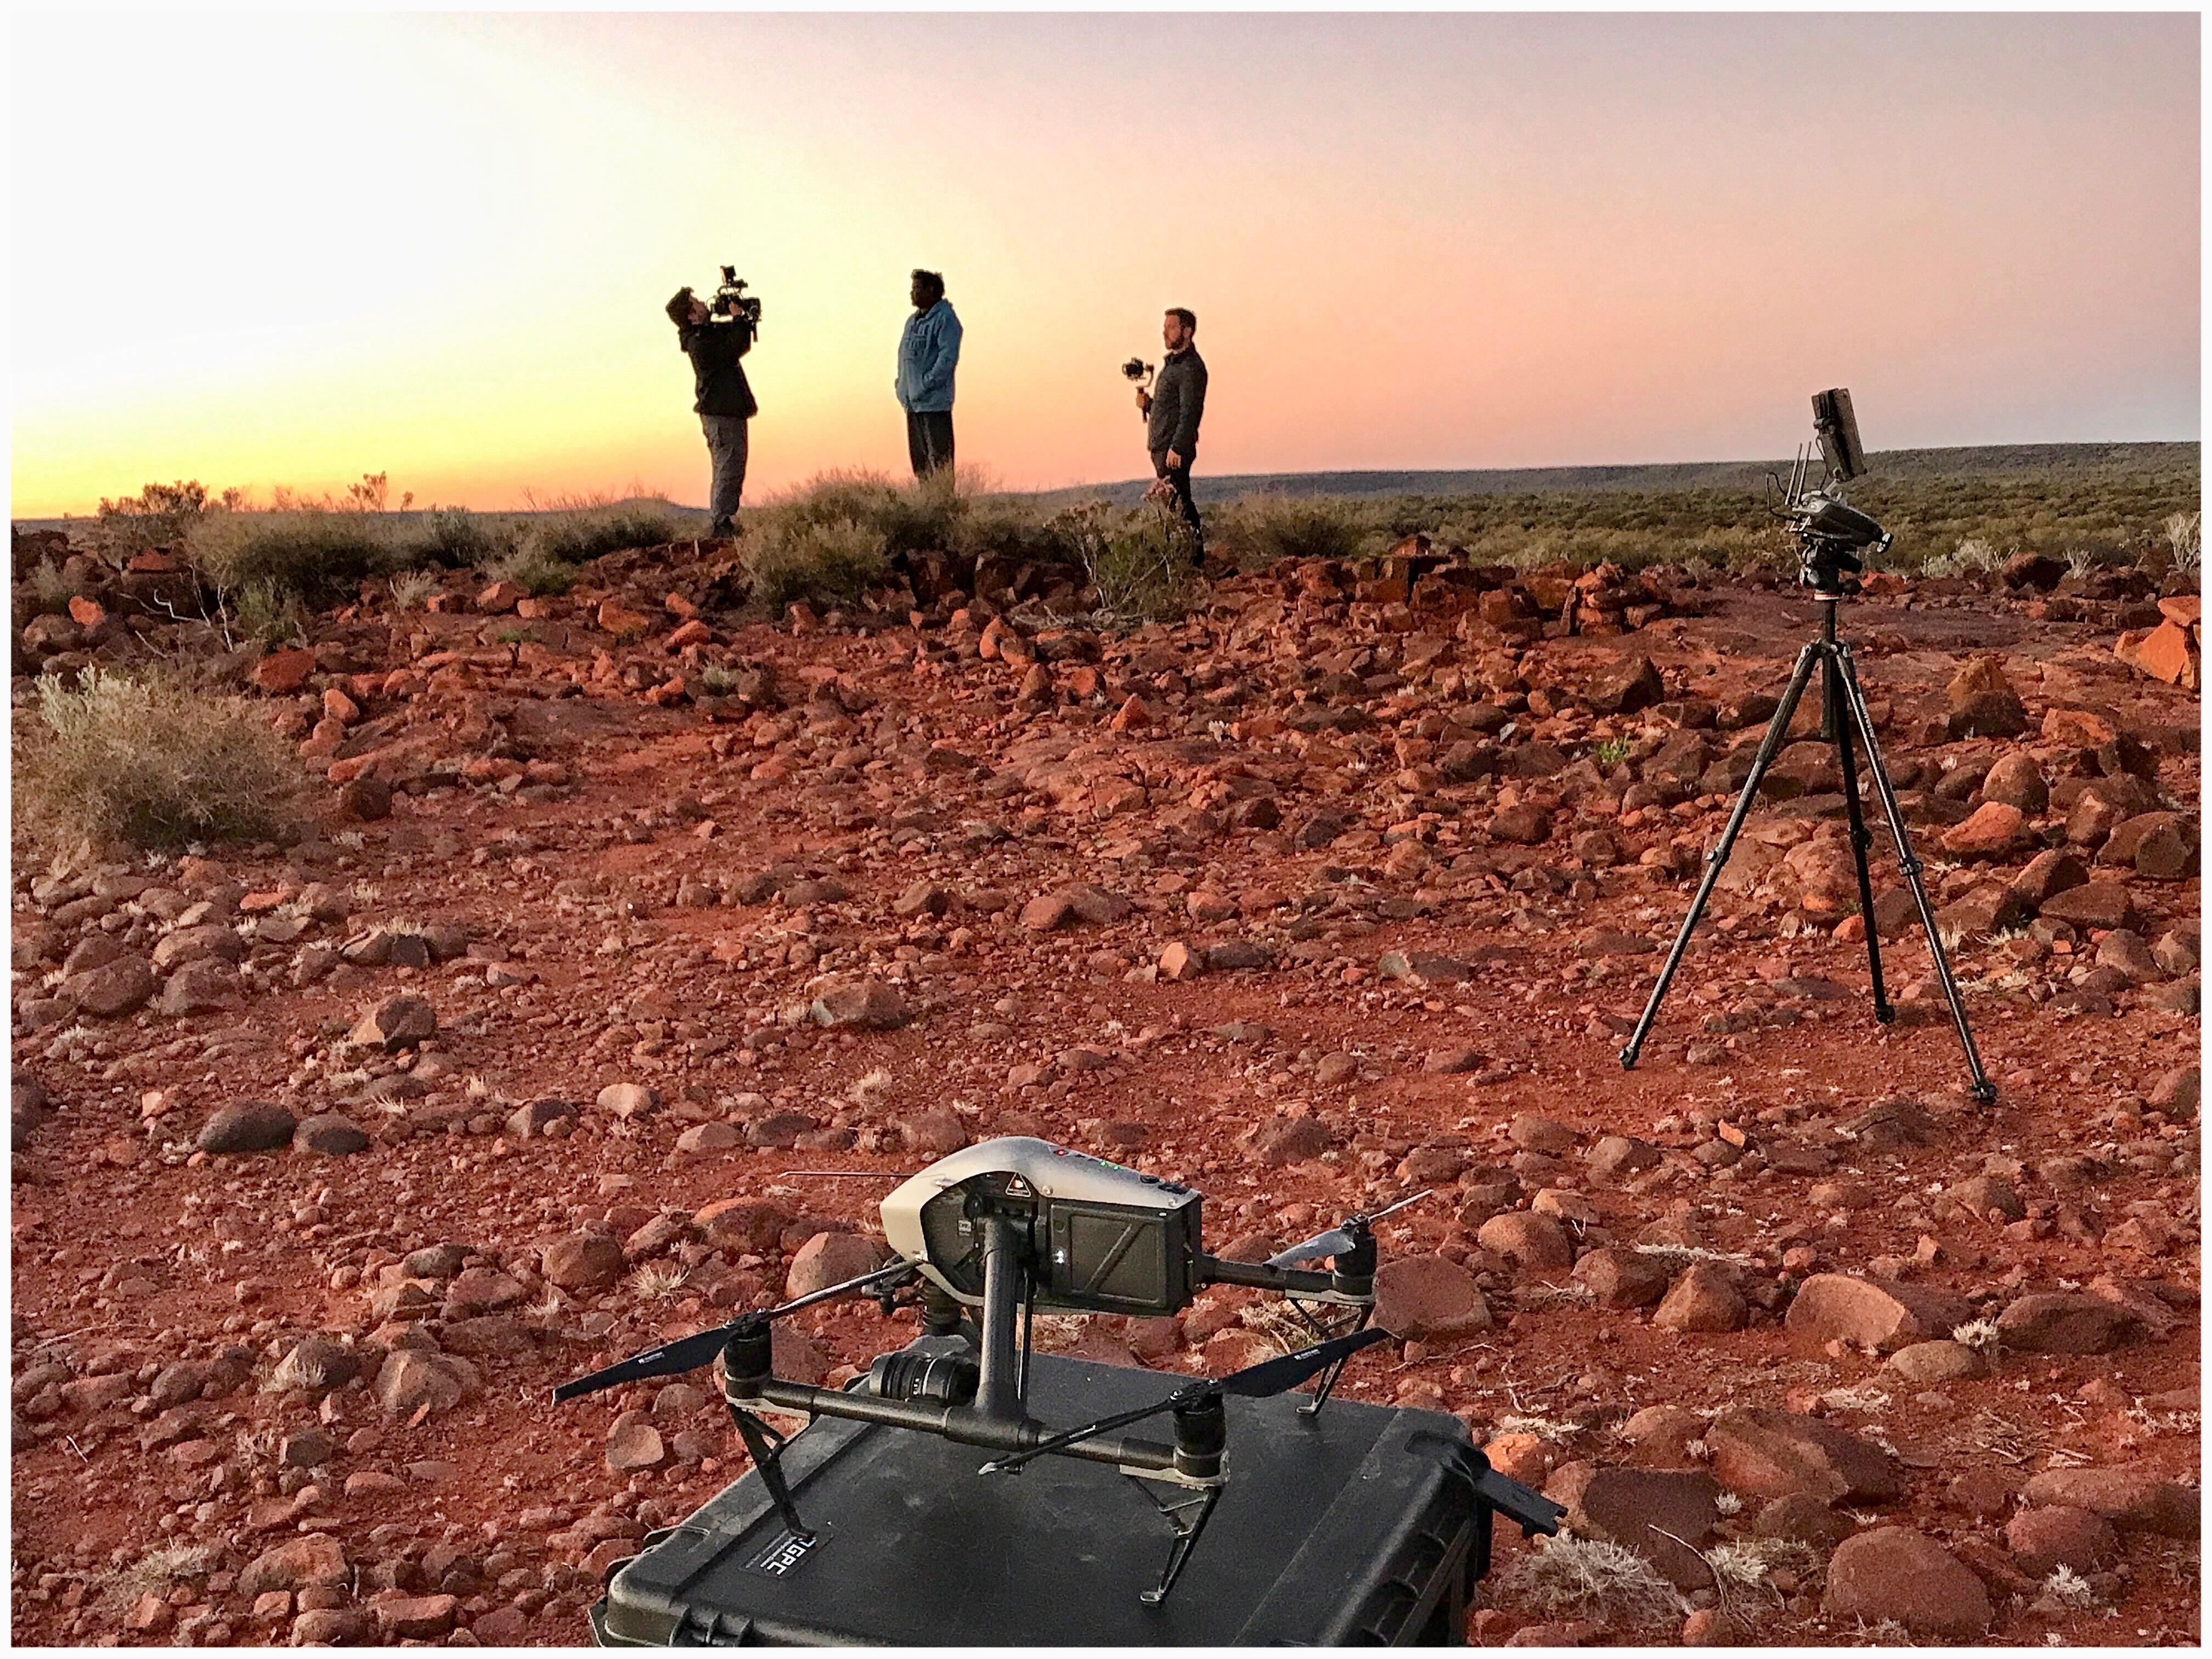 drone image sandalwood wiluna western australia estee lauder documentary the business debate film UN responsible Development Goals 1